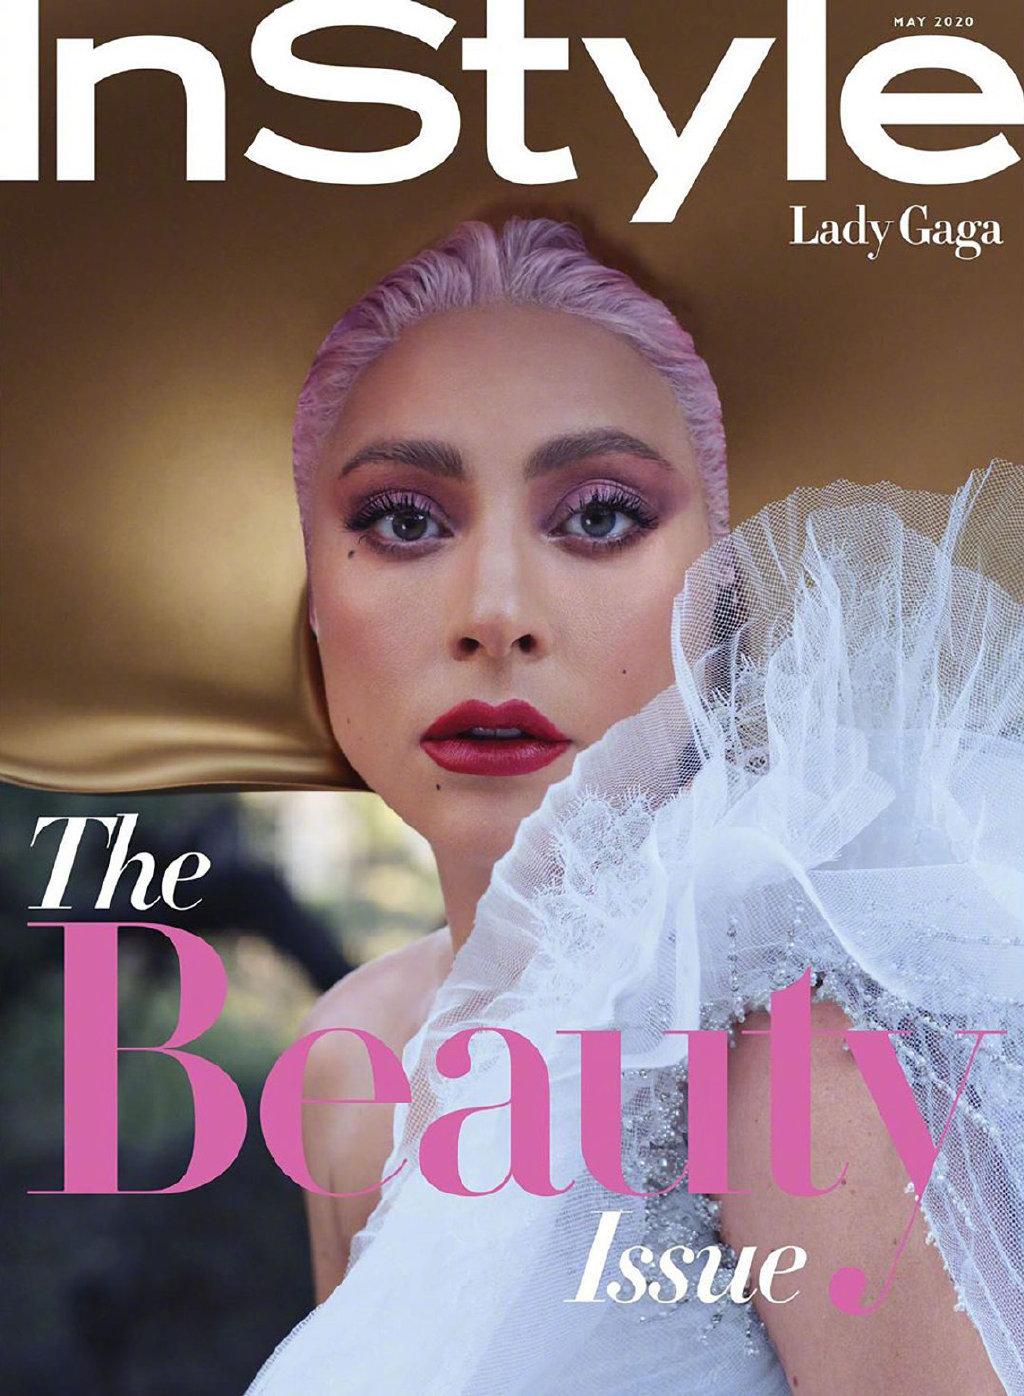 Lady Gaga X《Instyle》,这一组真的是时髦又好看~